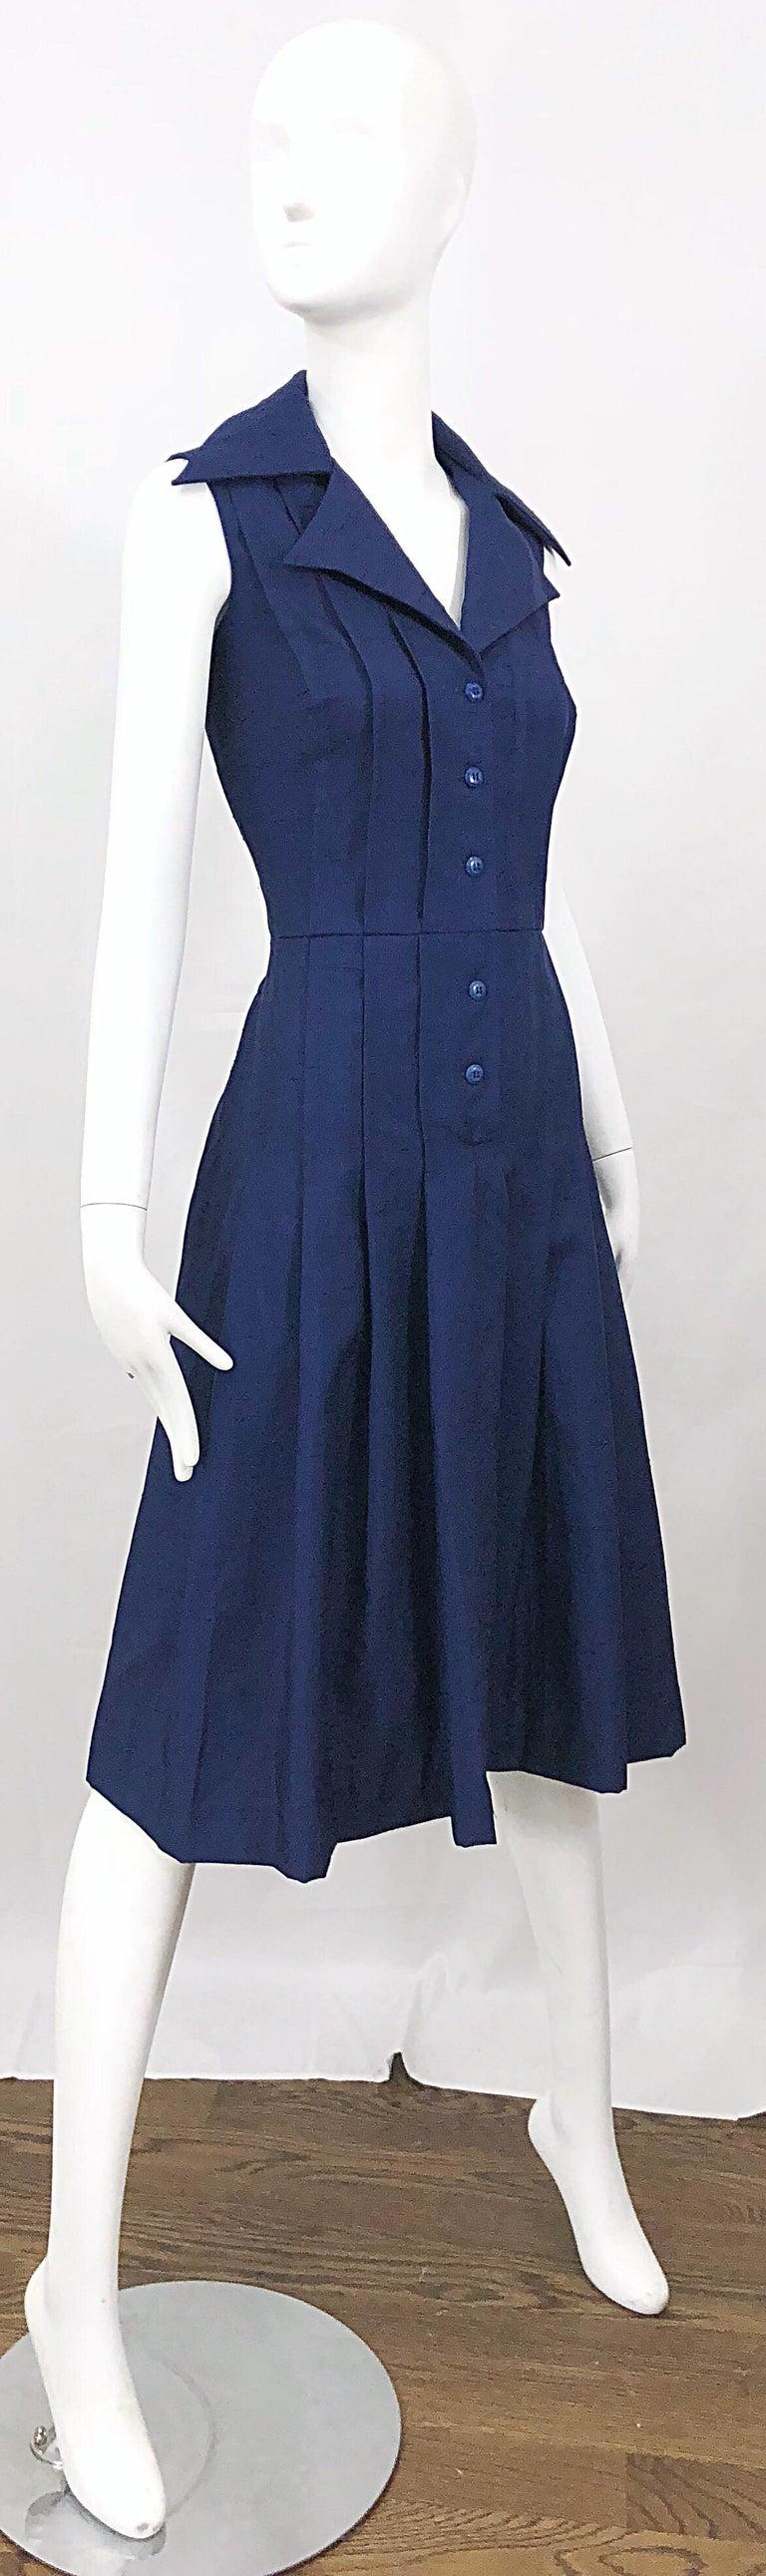 1990s Saks 5th Avenue Size 10 Navy Blue Silk Vintage 90s Sleeveless Shirt Dress For Sale 9